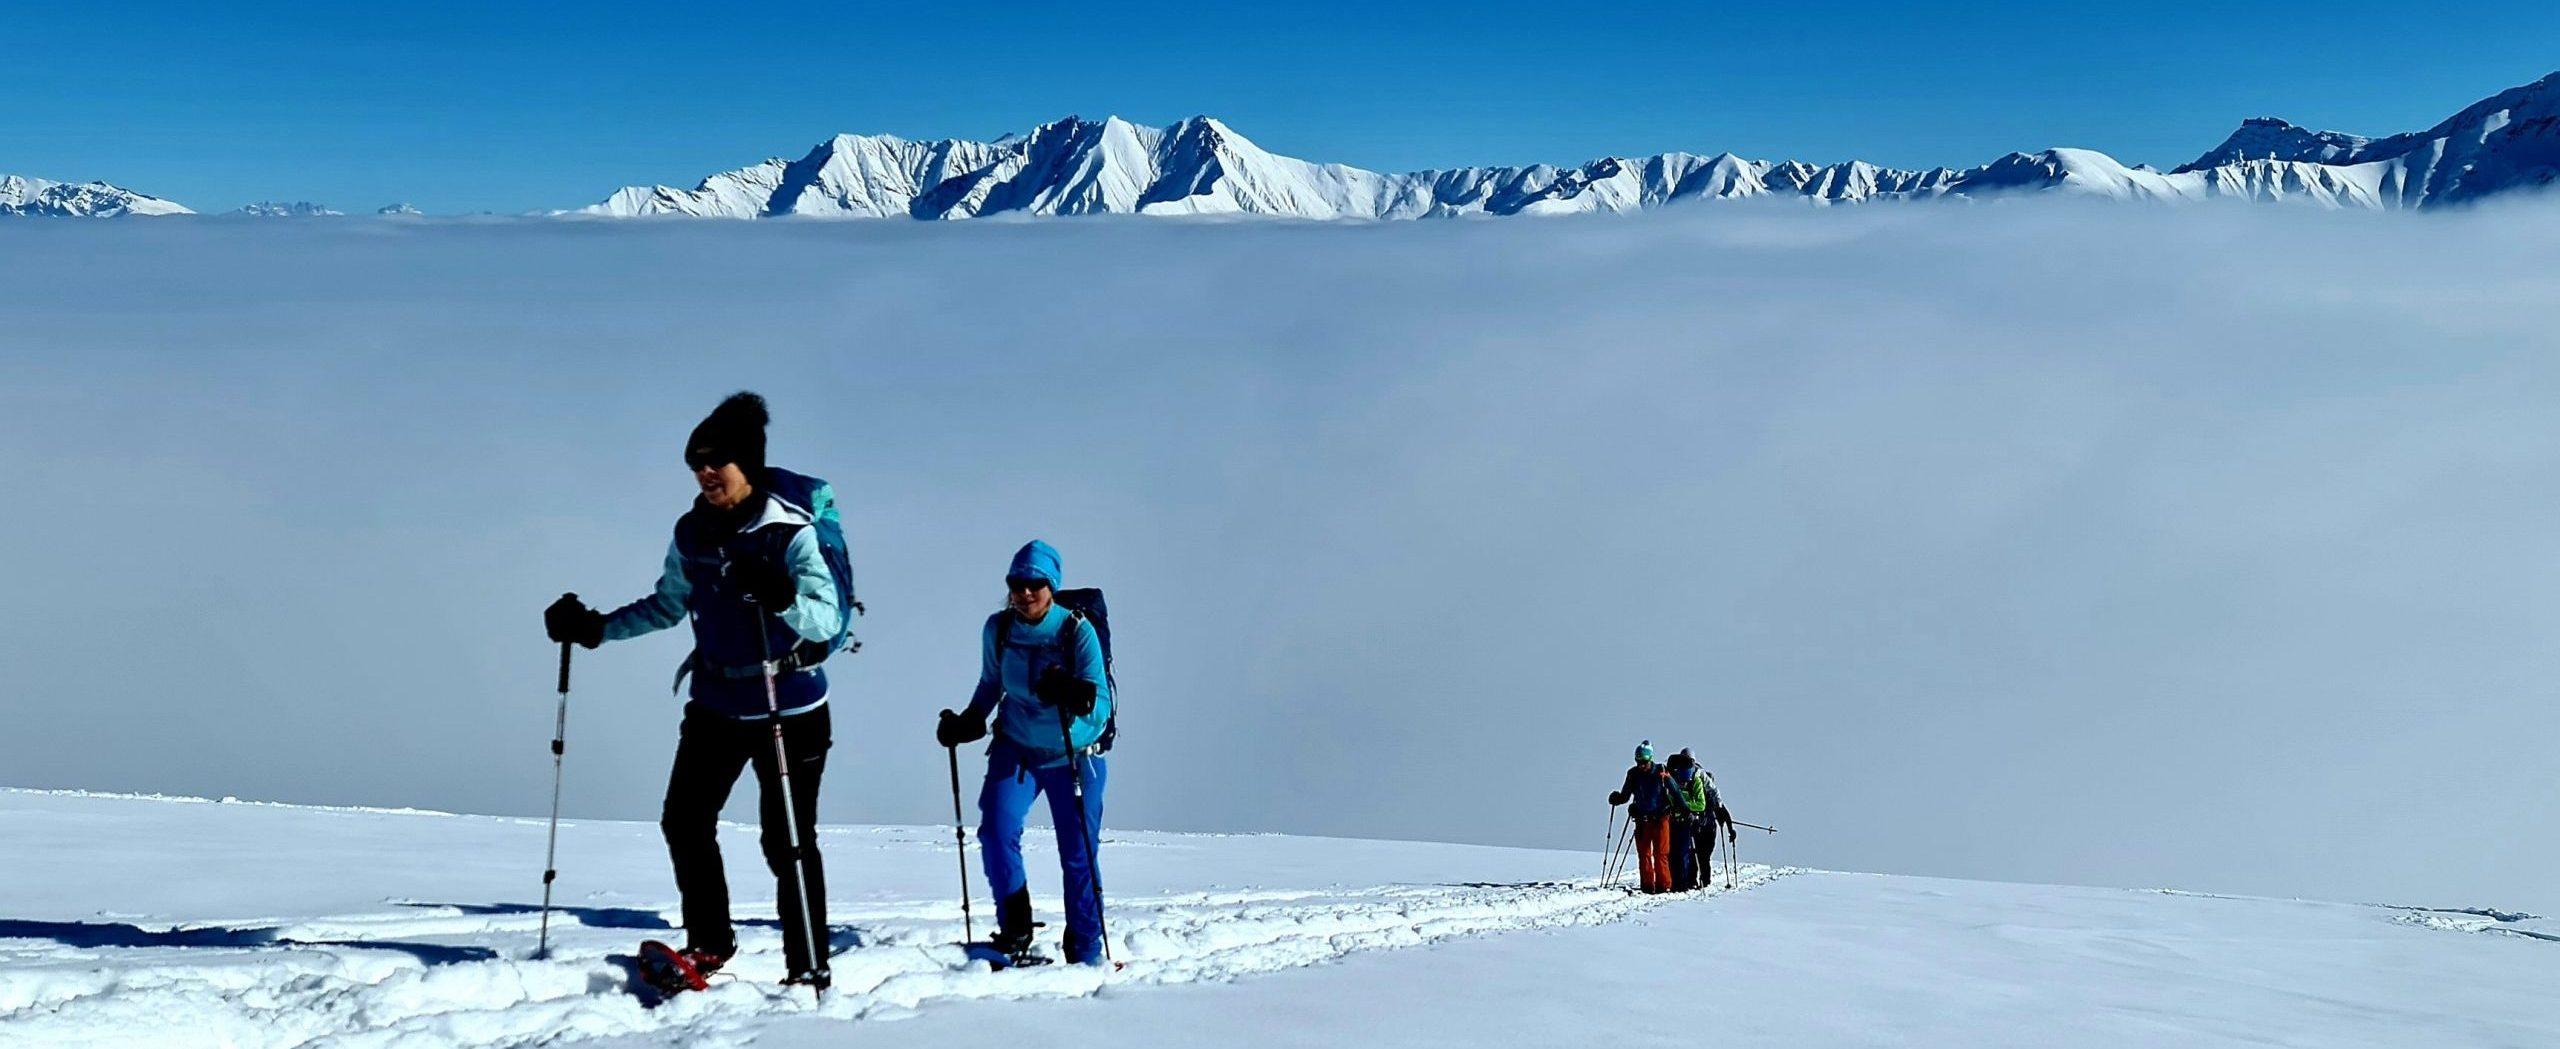 Schneeschuhtour Um Su